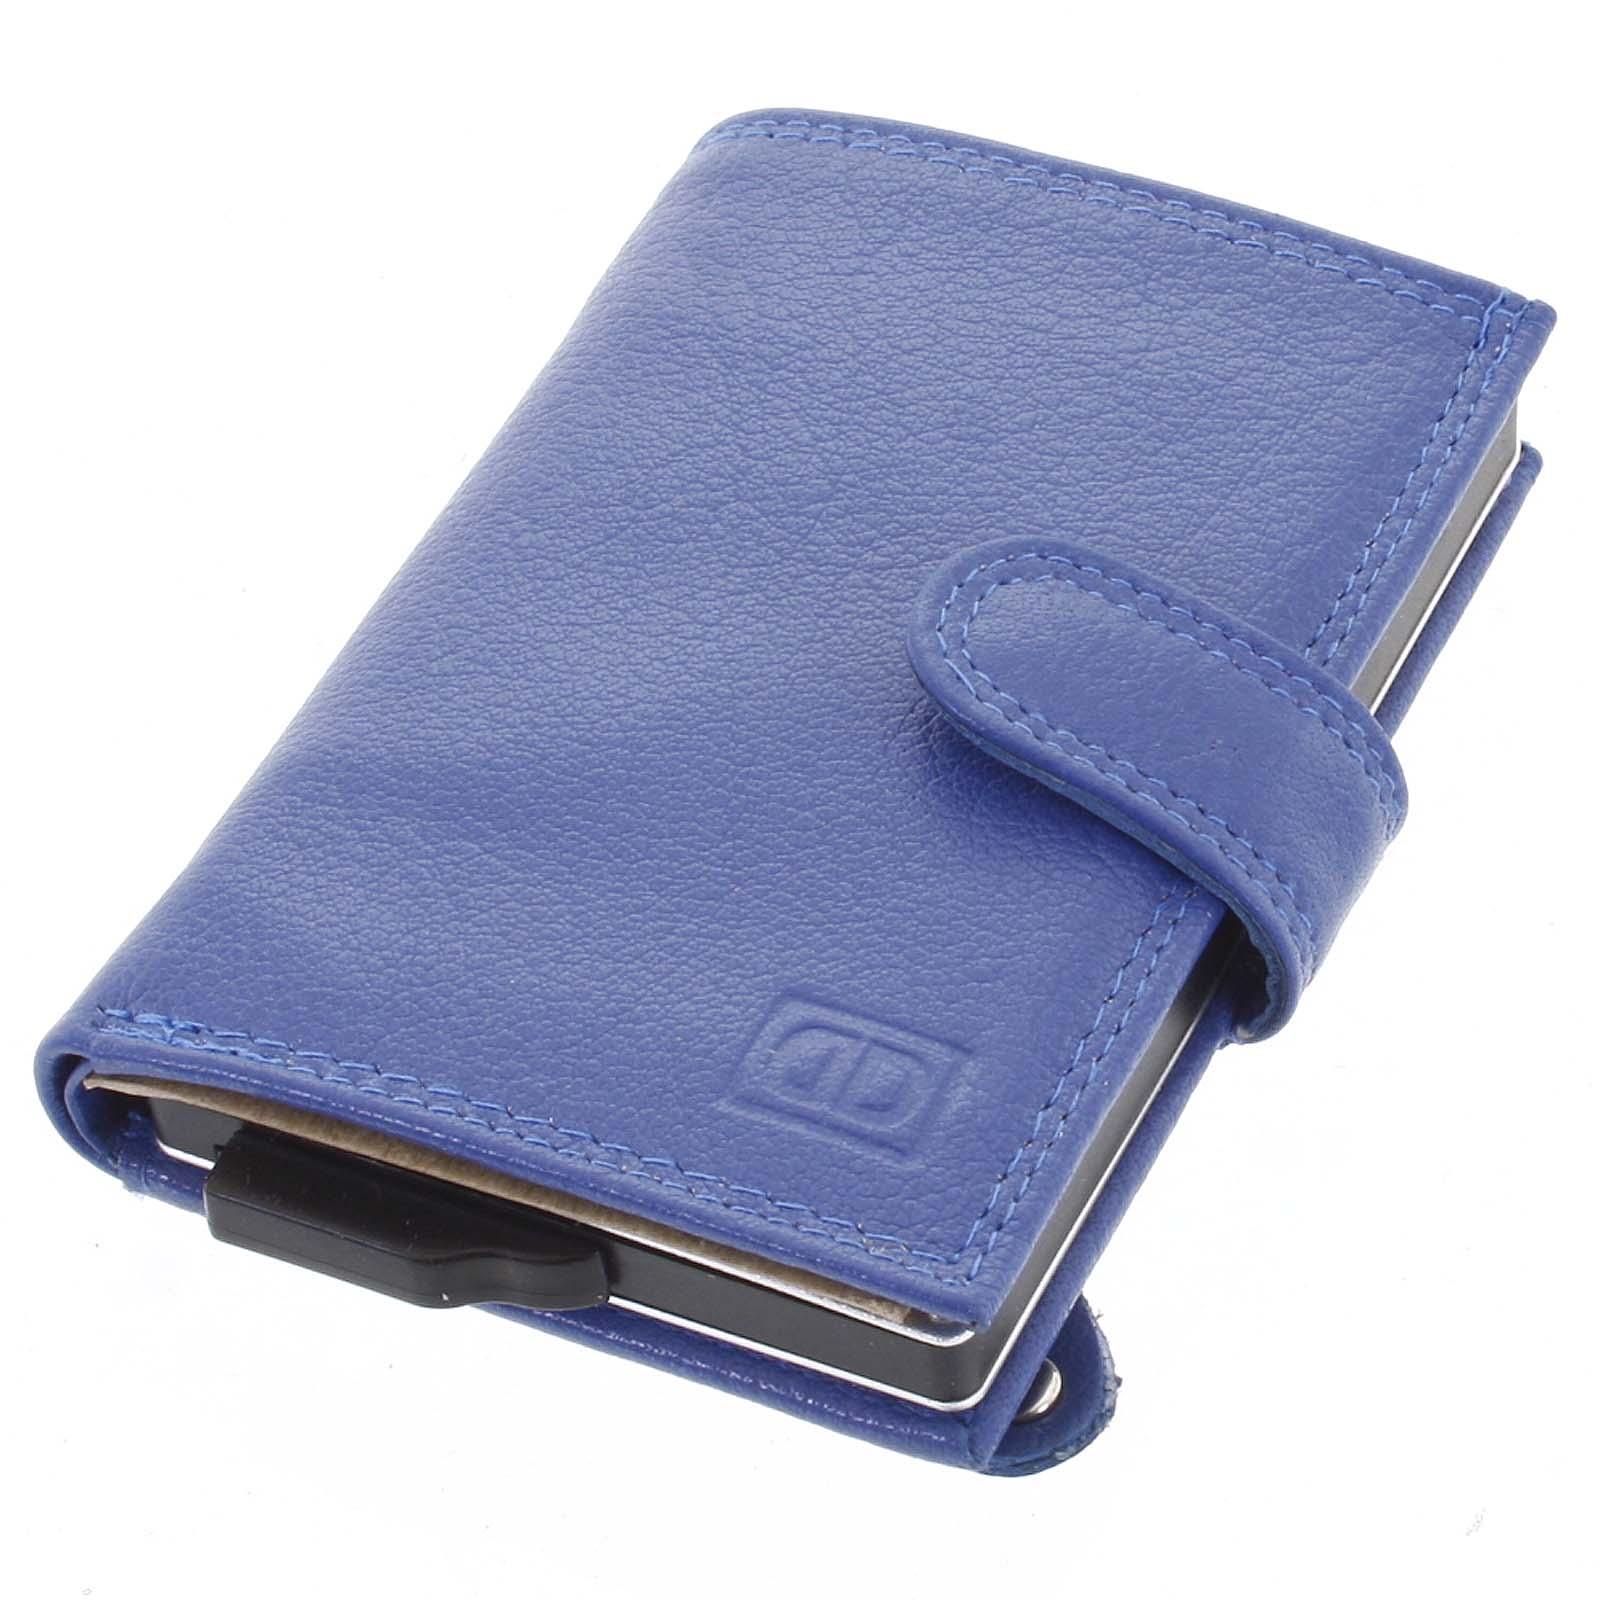 Kožené pouzdro na karty modré - Double-D Jokim